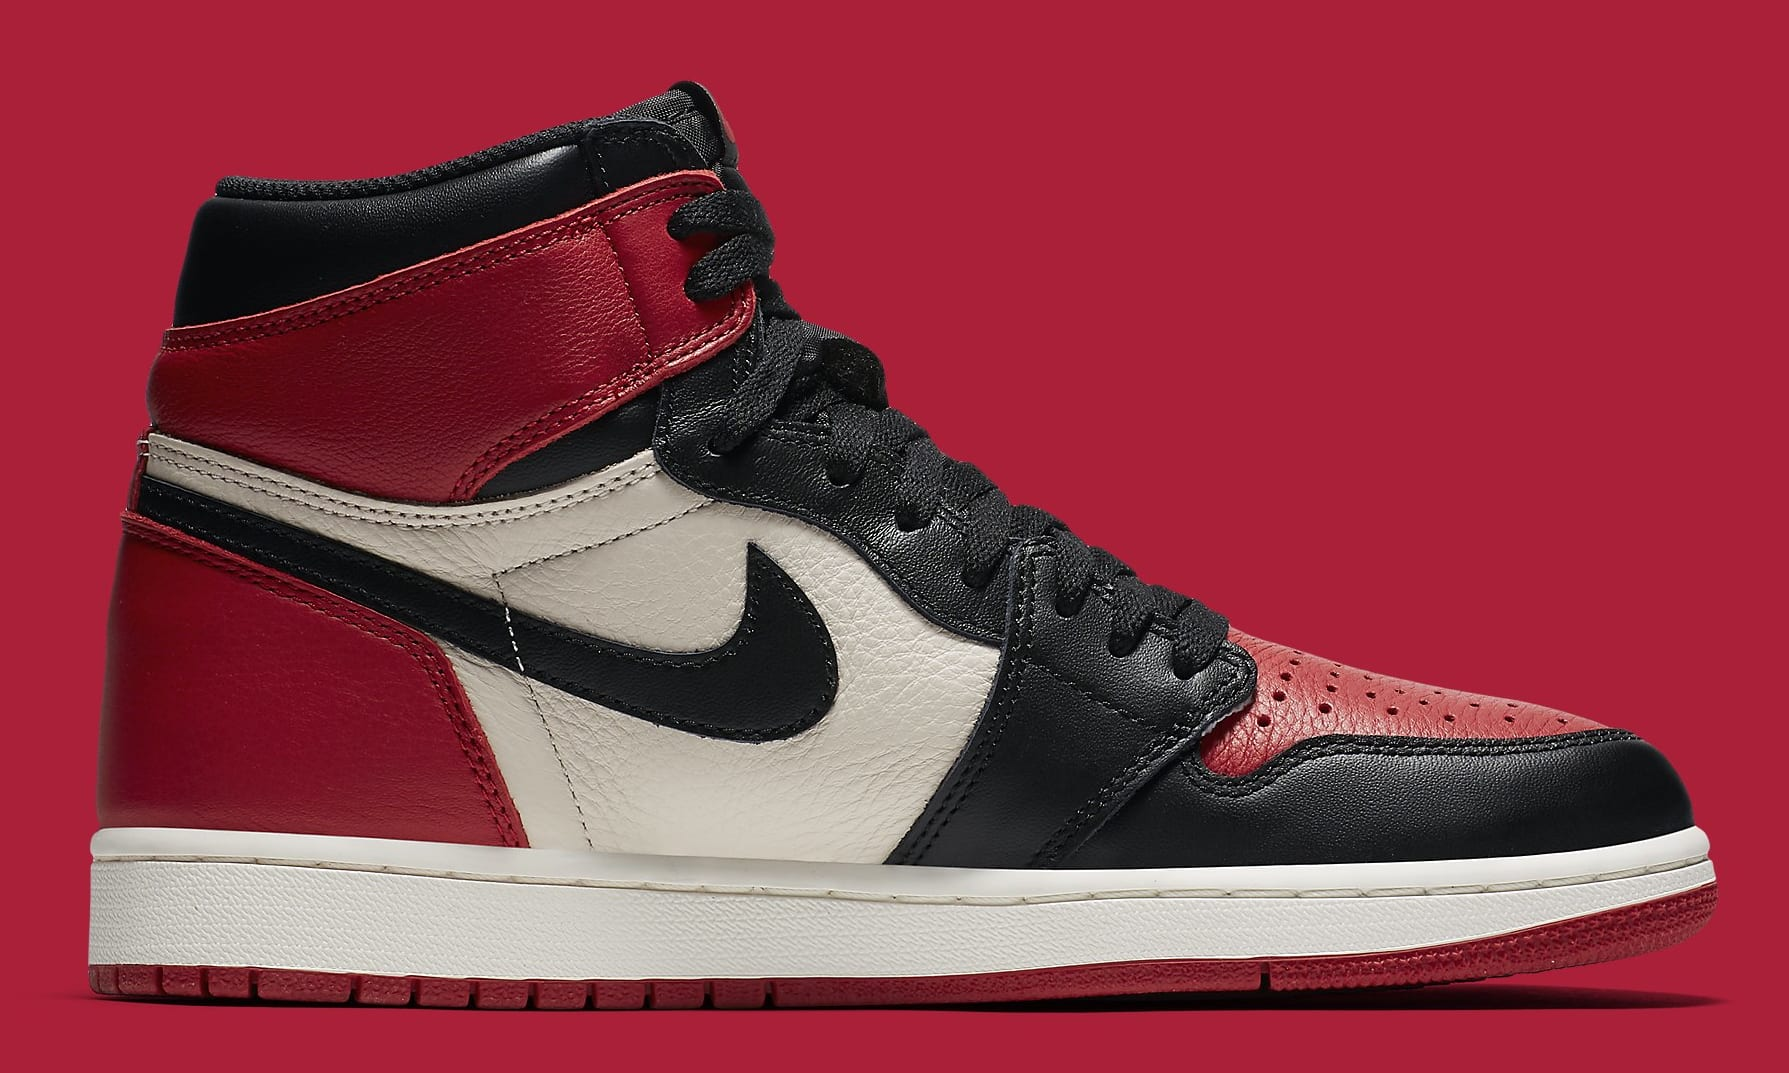 350907dfecd2 ... release cb1ad 446d0 Image via Nike Air Jordan 1 Bred Toe Gym RedBlack  ...